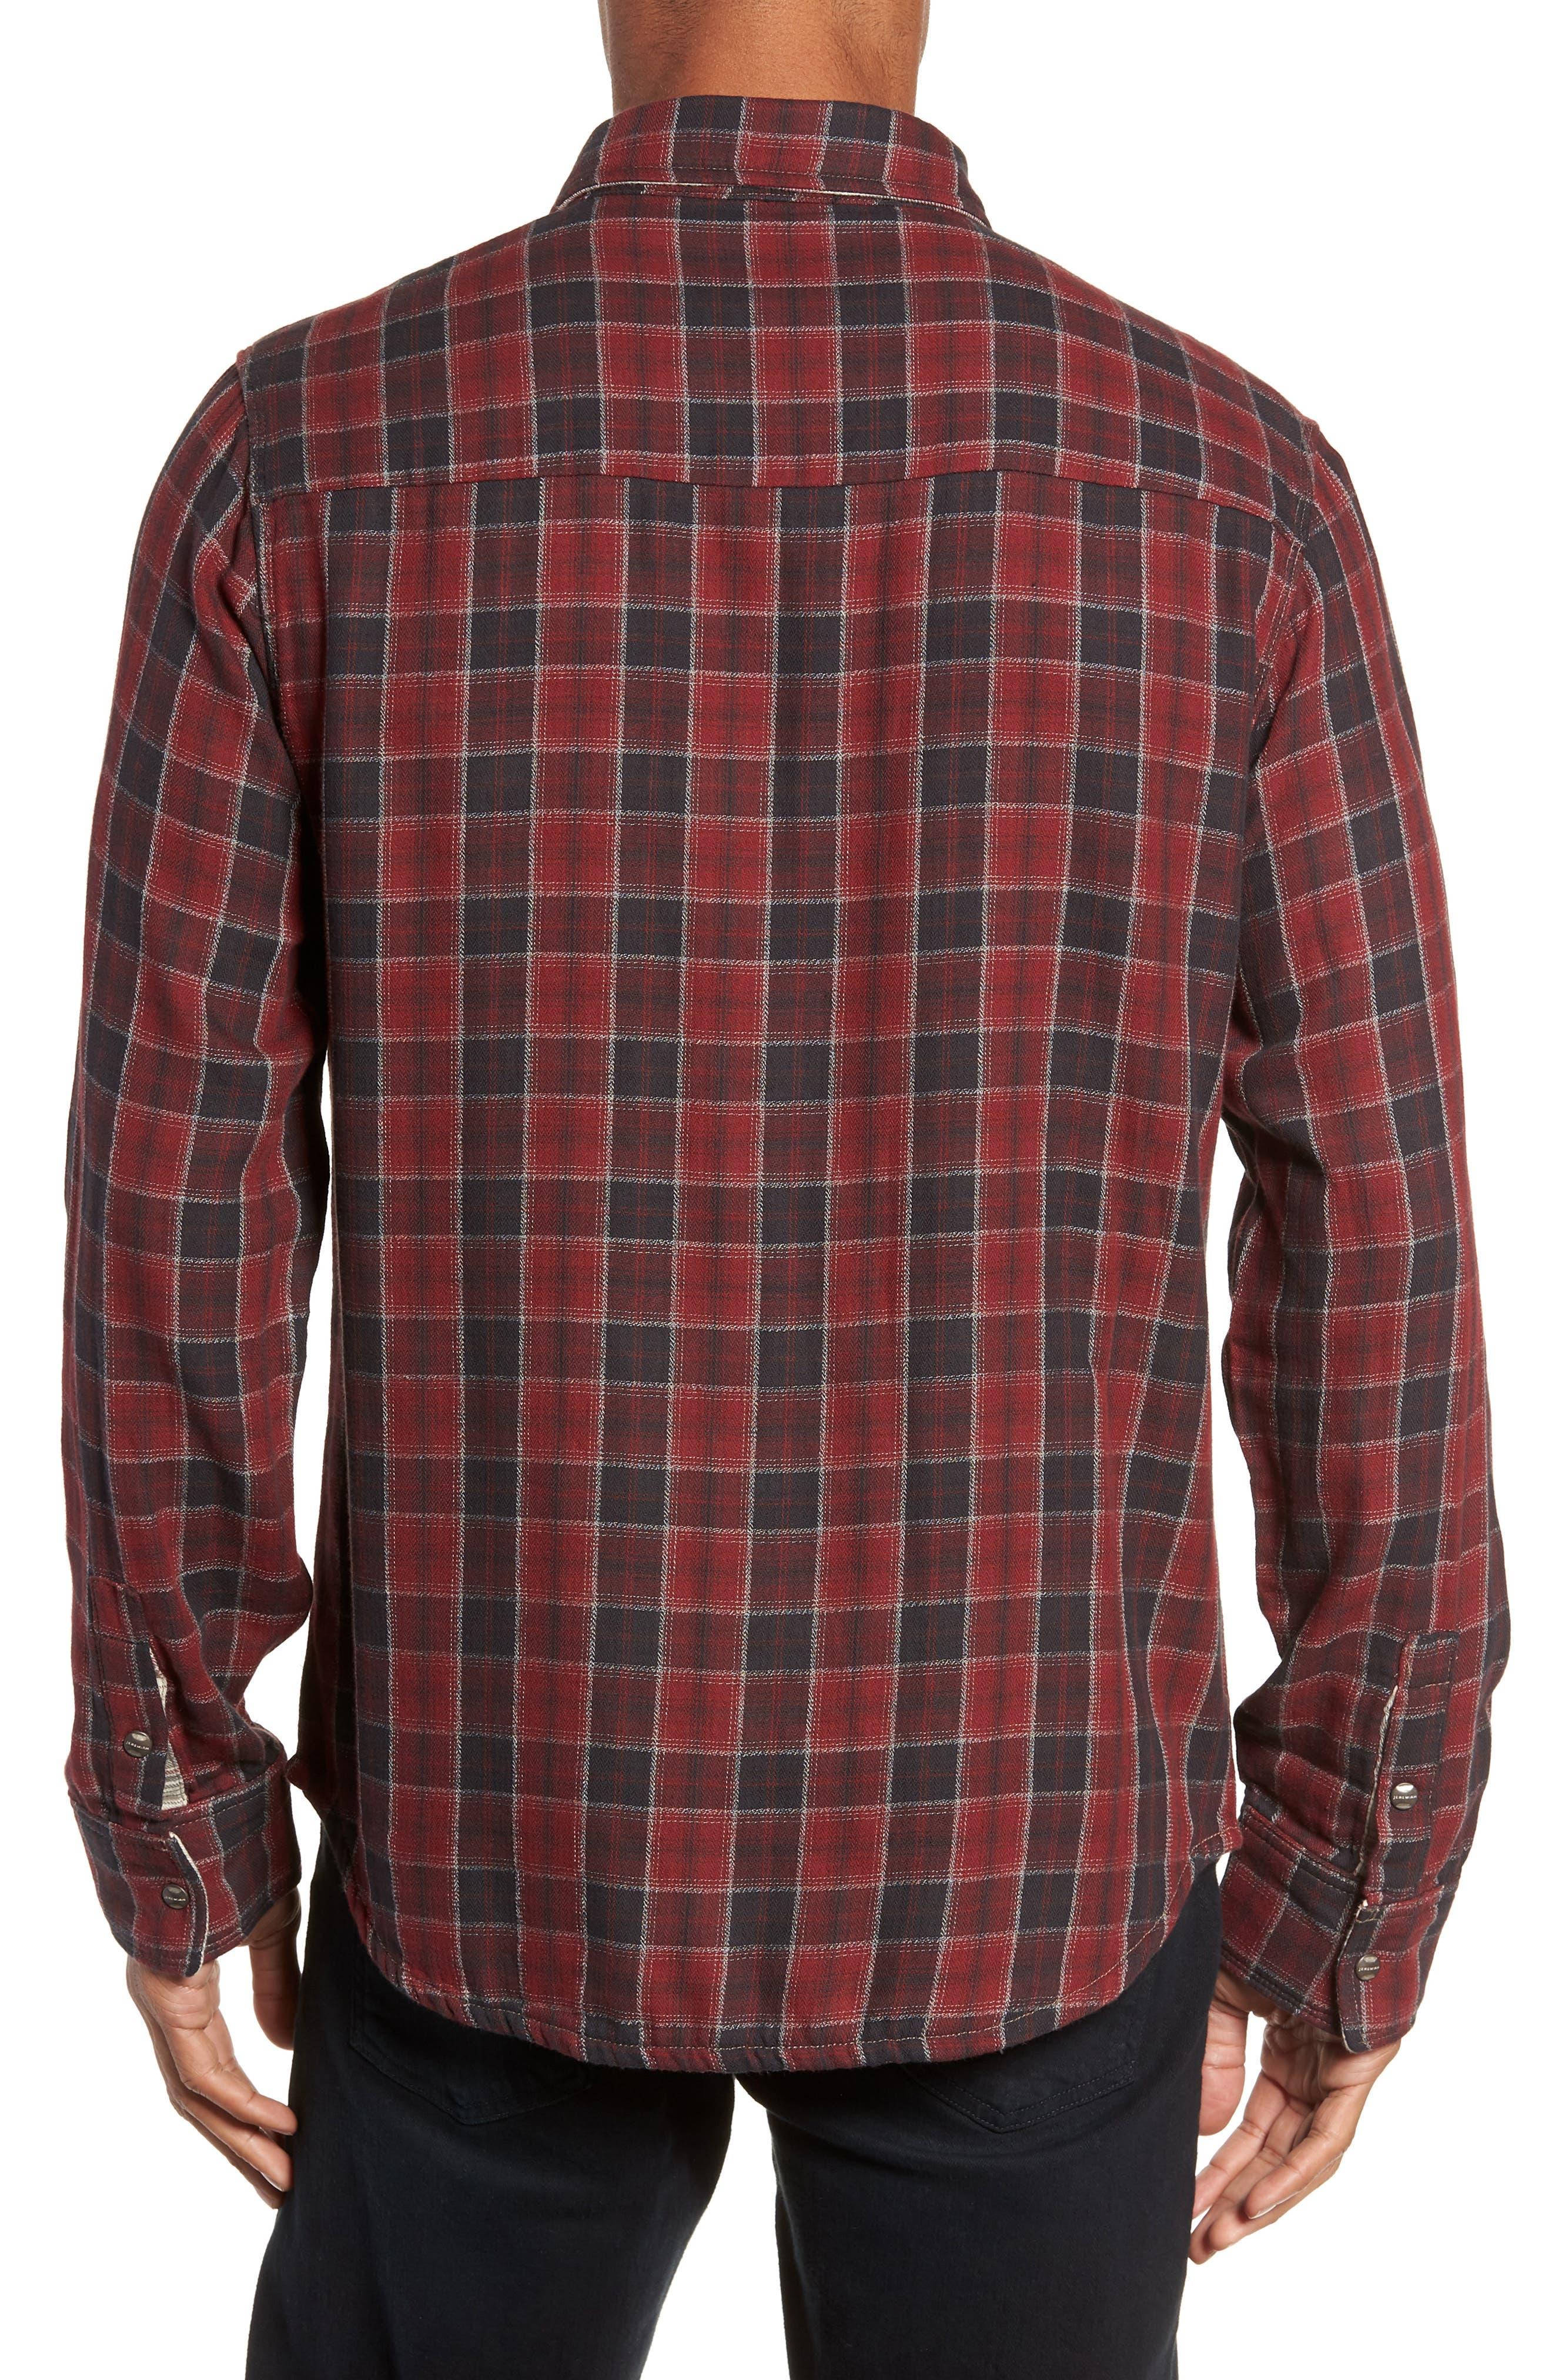 Boulder Regular Fit Reversible Plaid Shirt,                             Alternate thumbnail 4, color,                             OXBLOOD